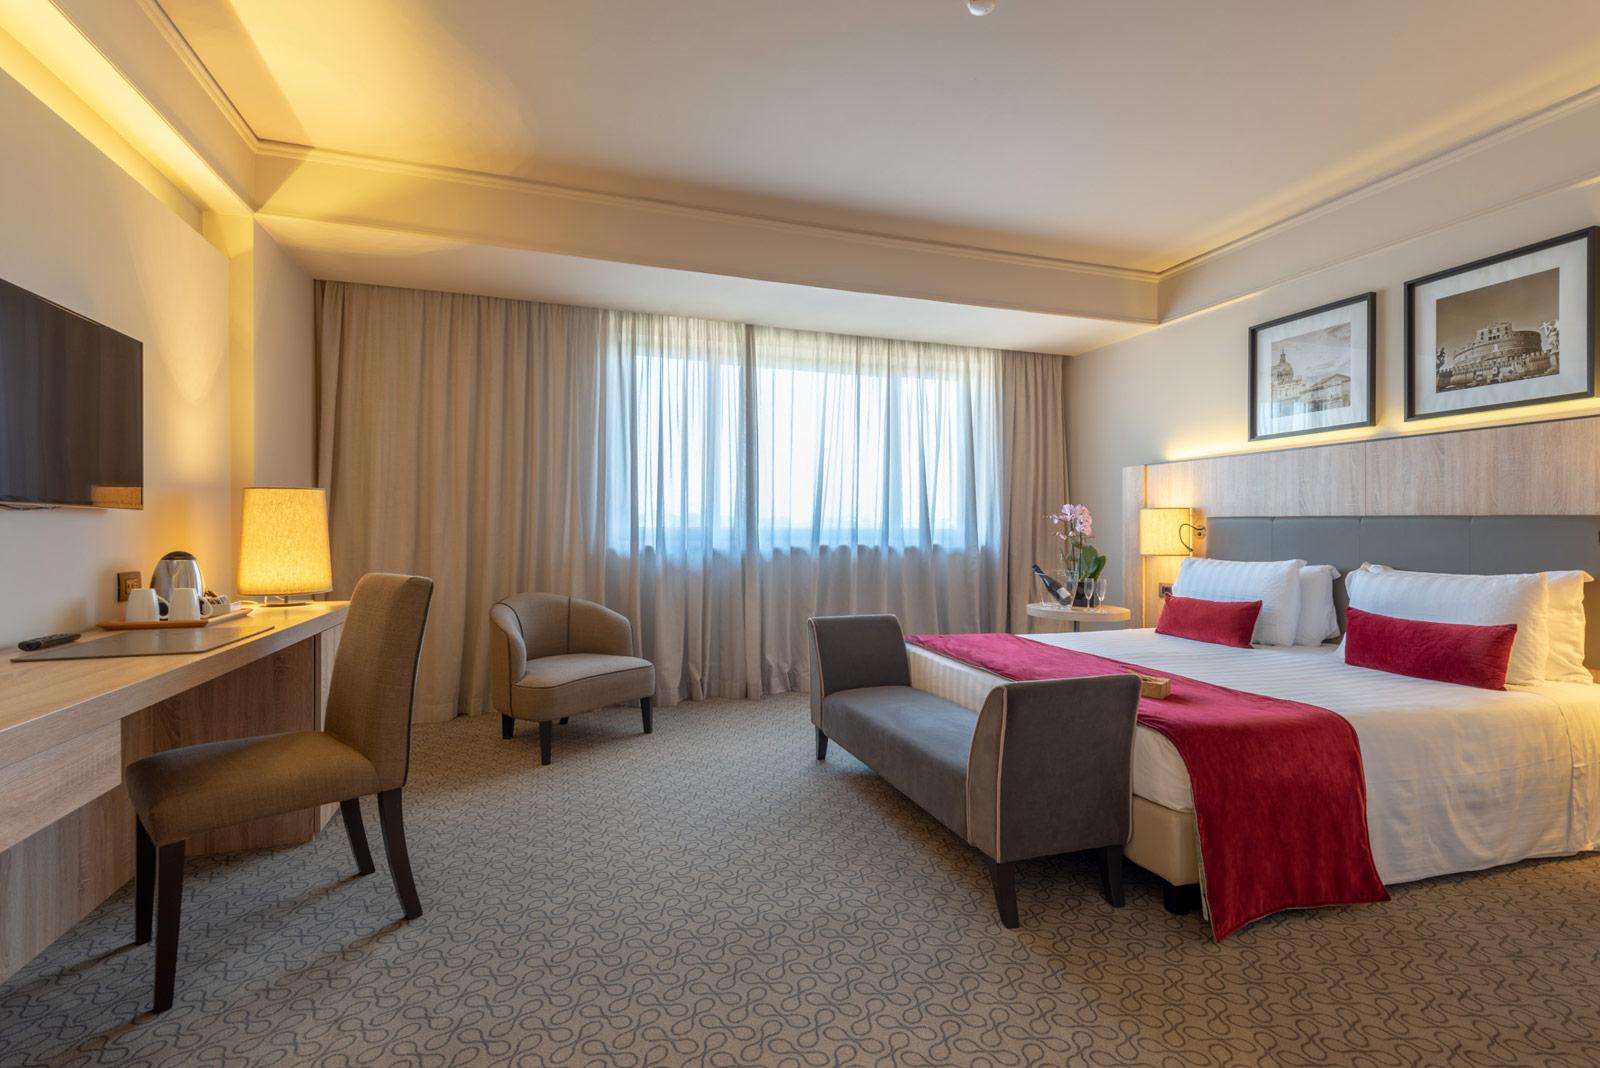 Hotel Executive Roma | Le nostre camere Executive | Hotel ...